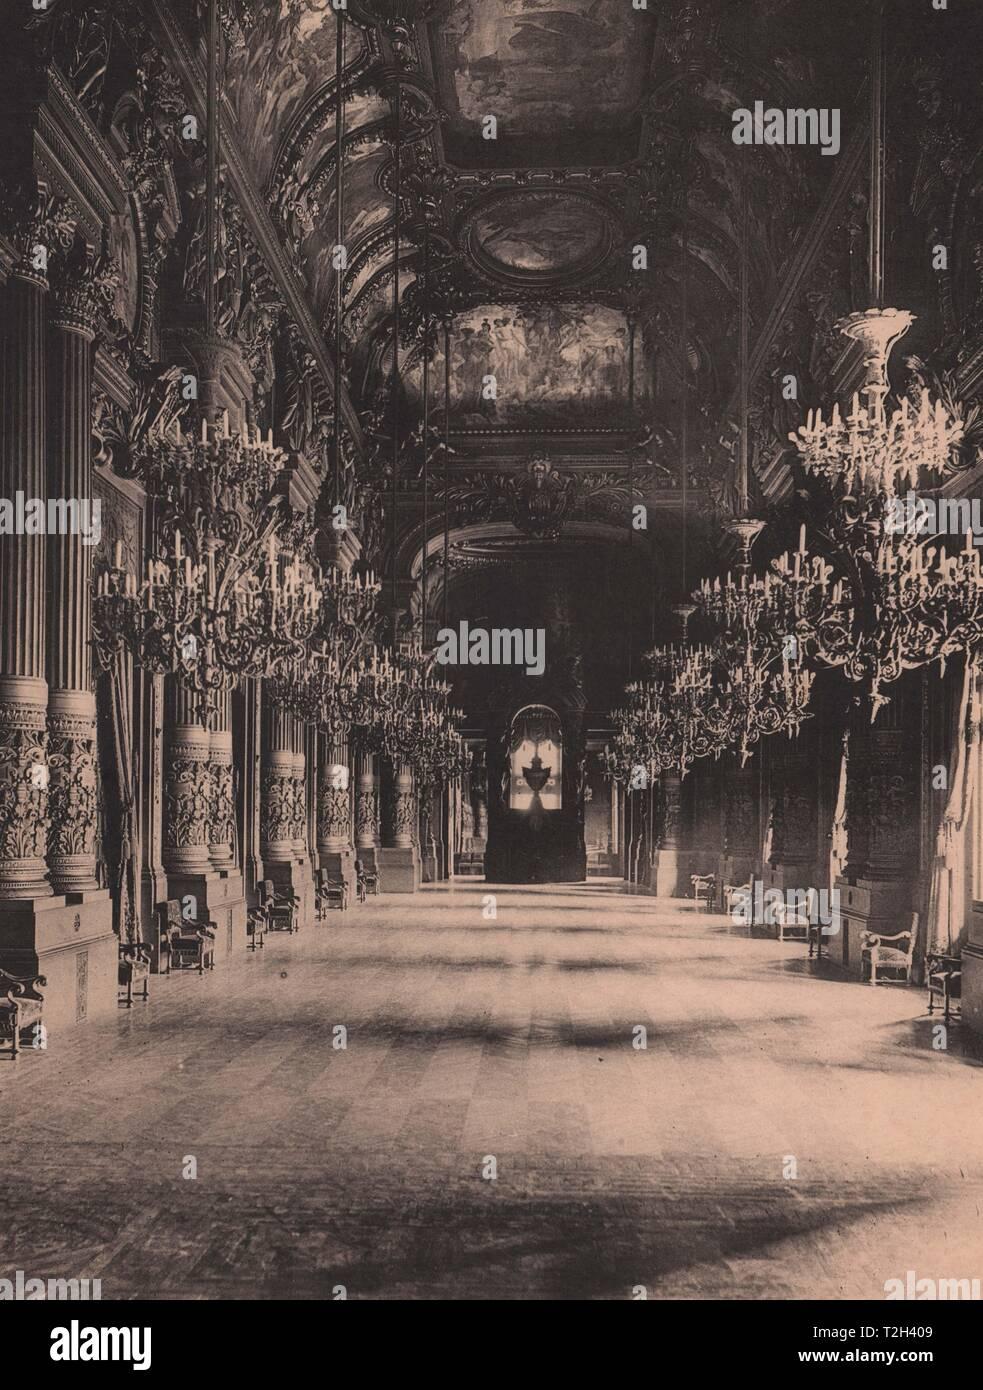 Intérieur de l'Opéra Stockbild